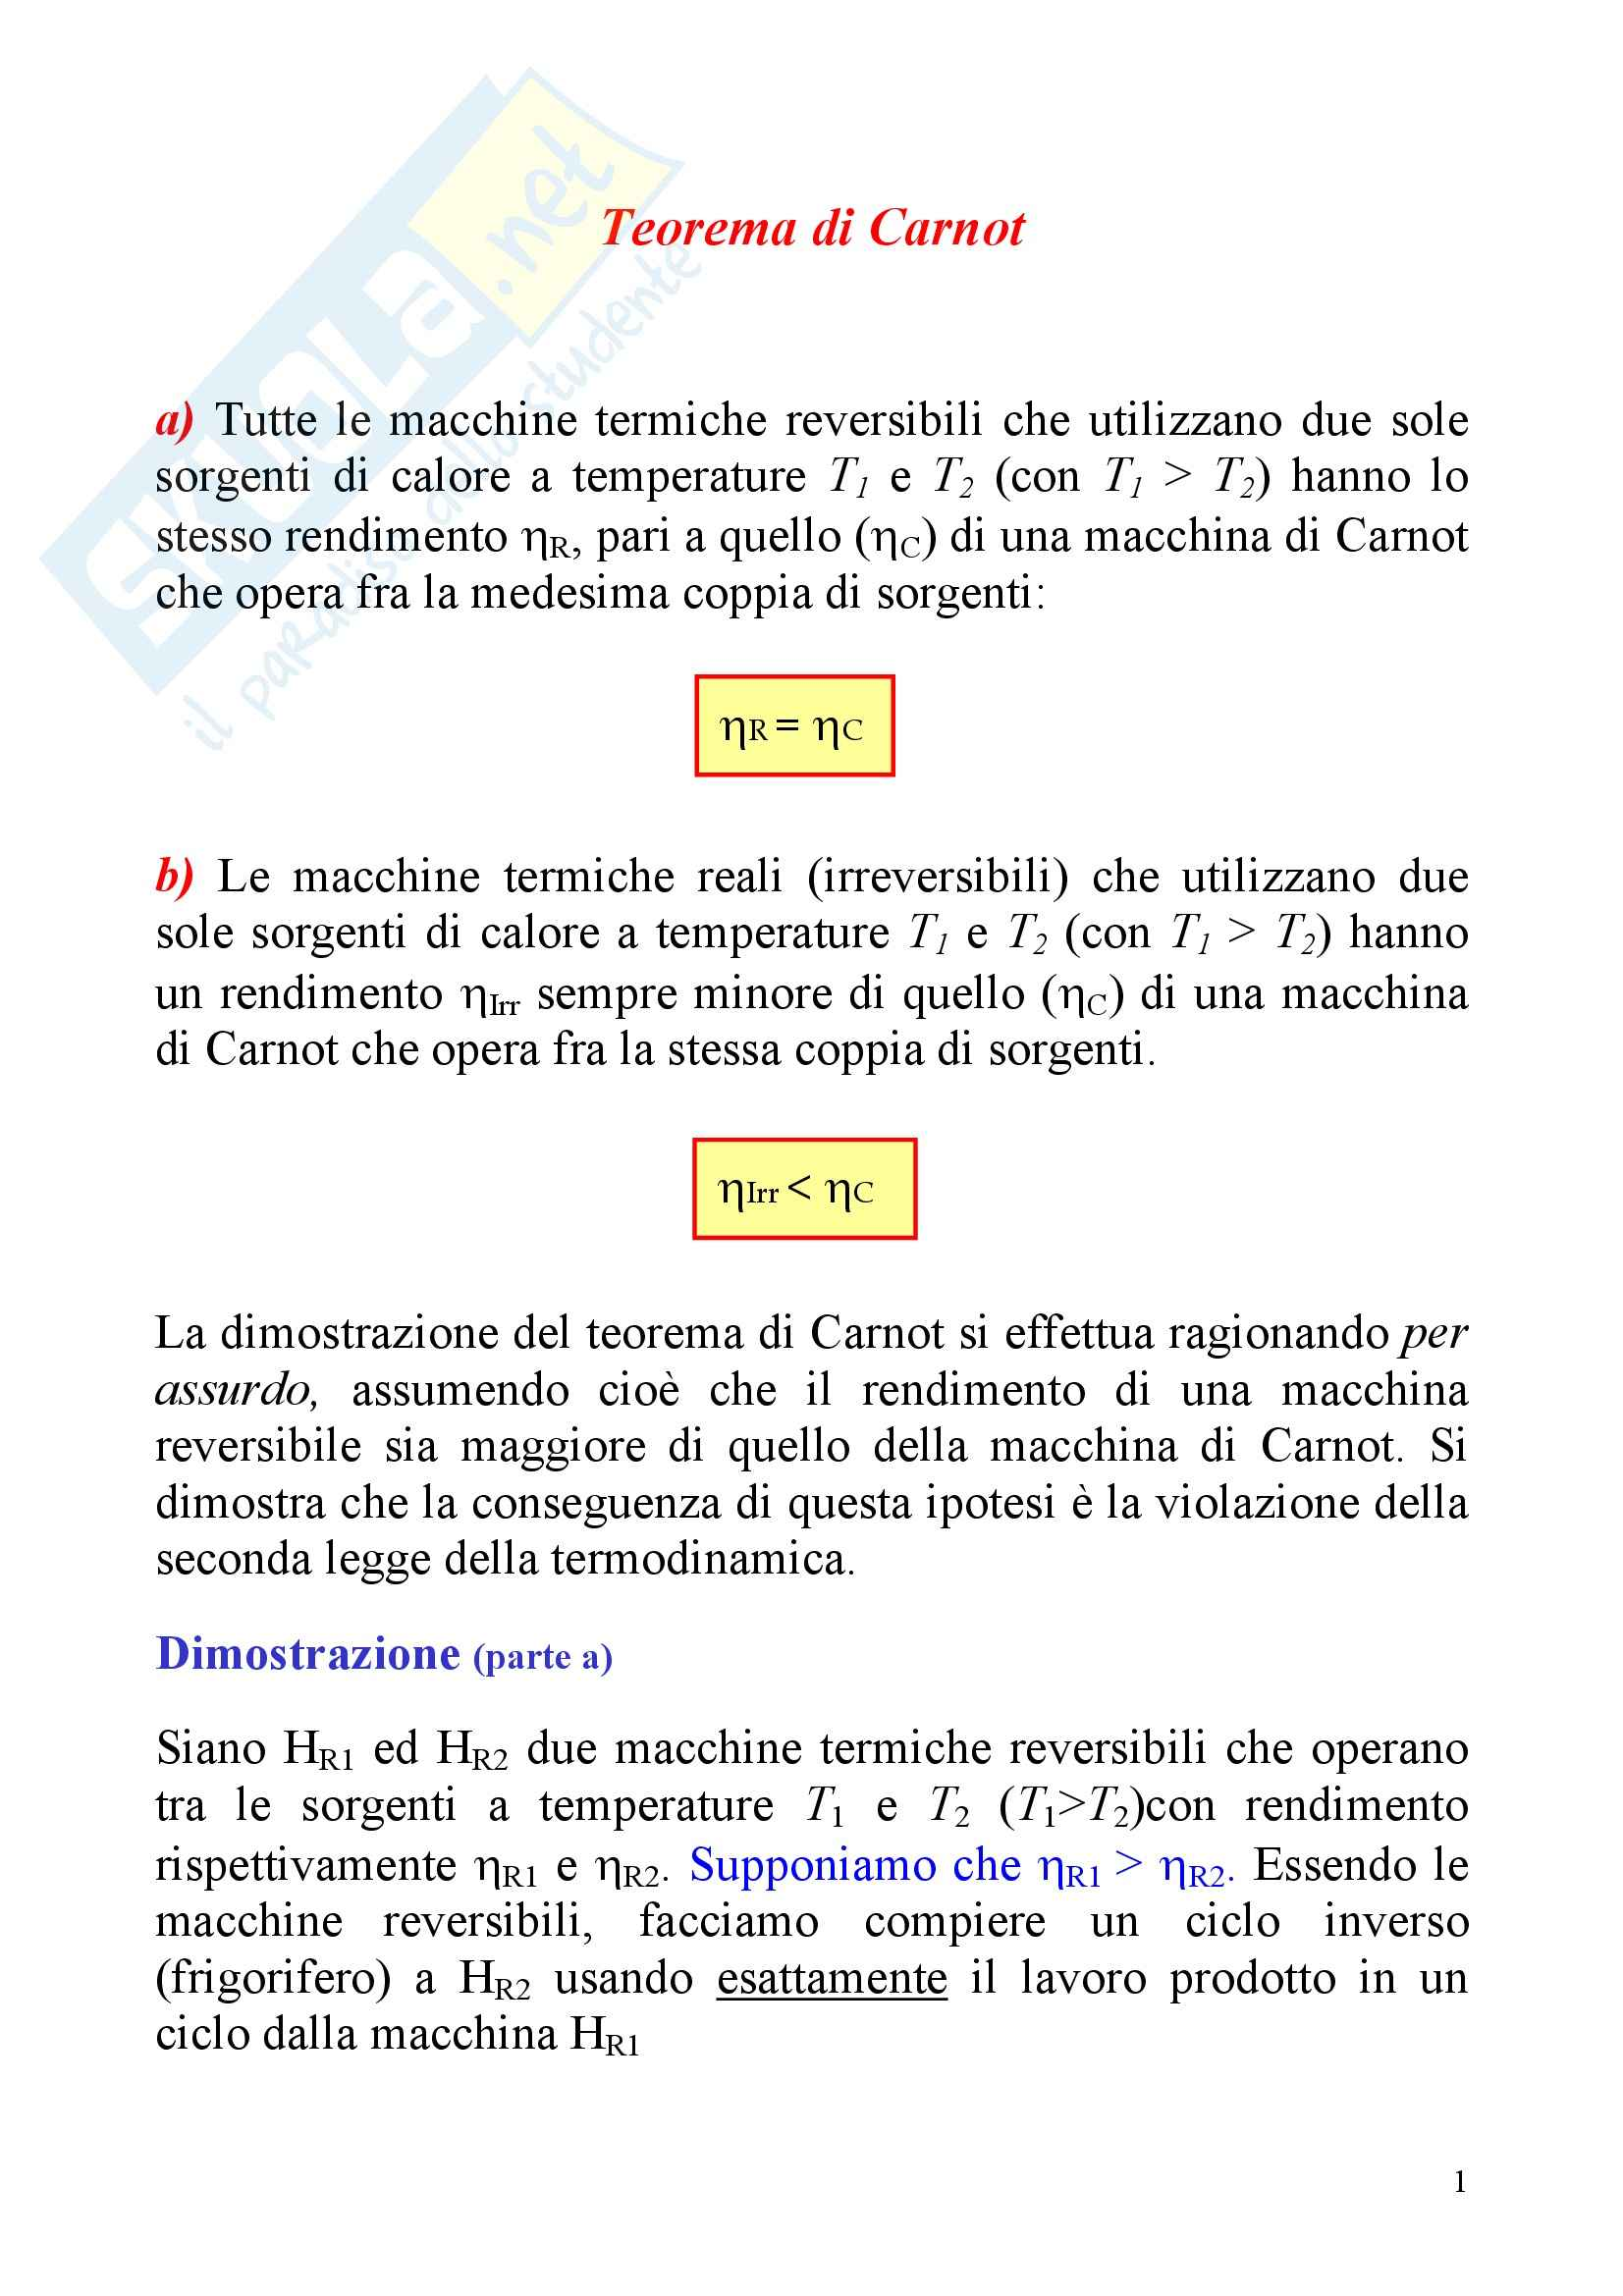 Fisica statistica ed informatica – Teorema di Carnot